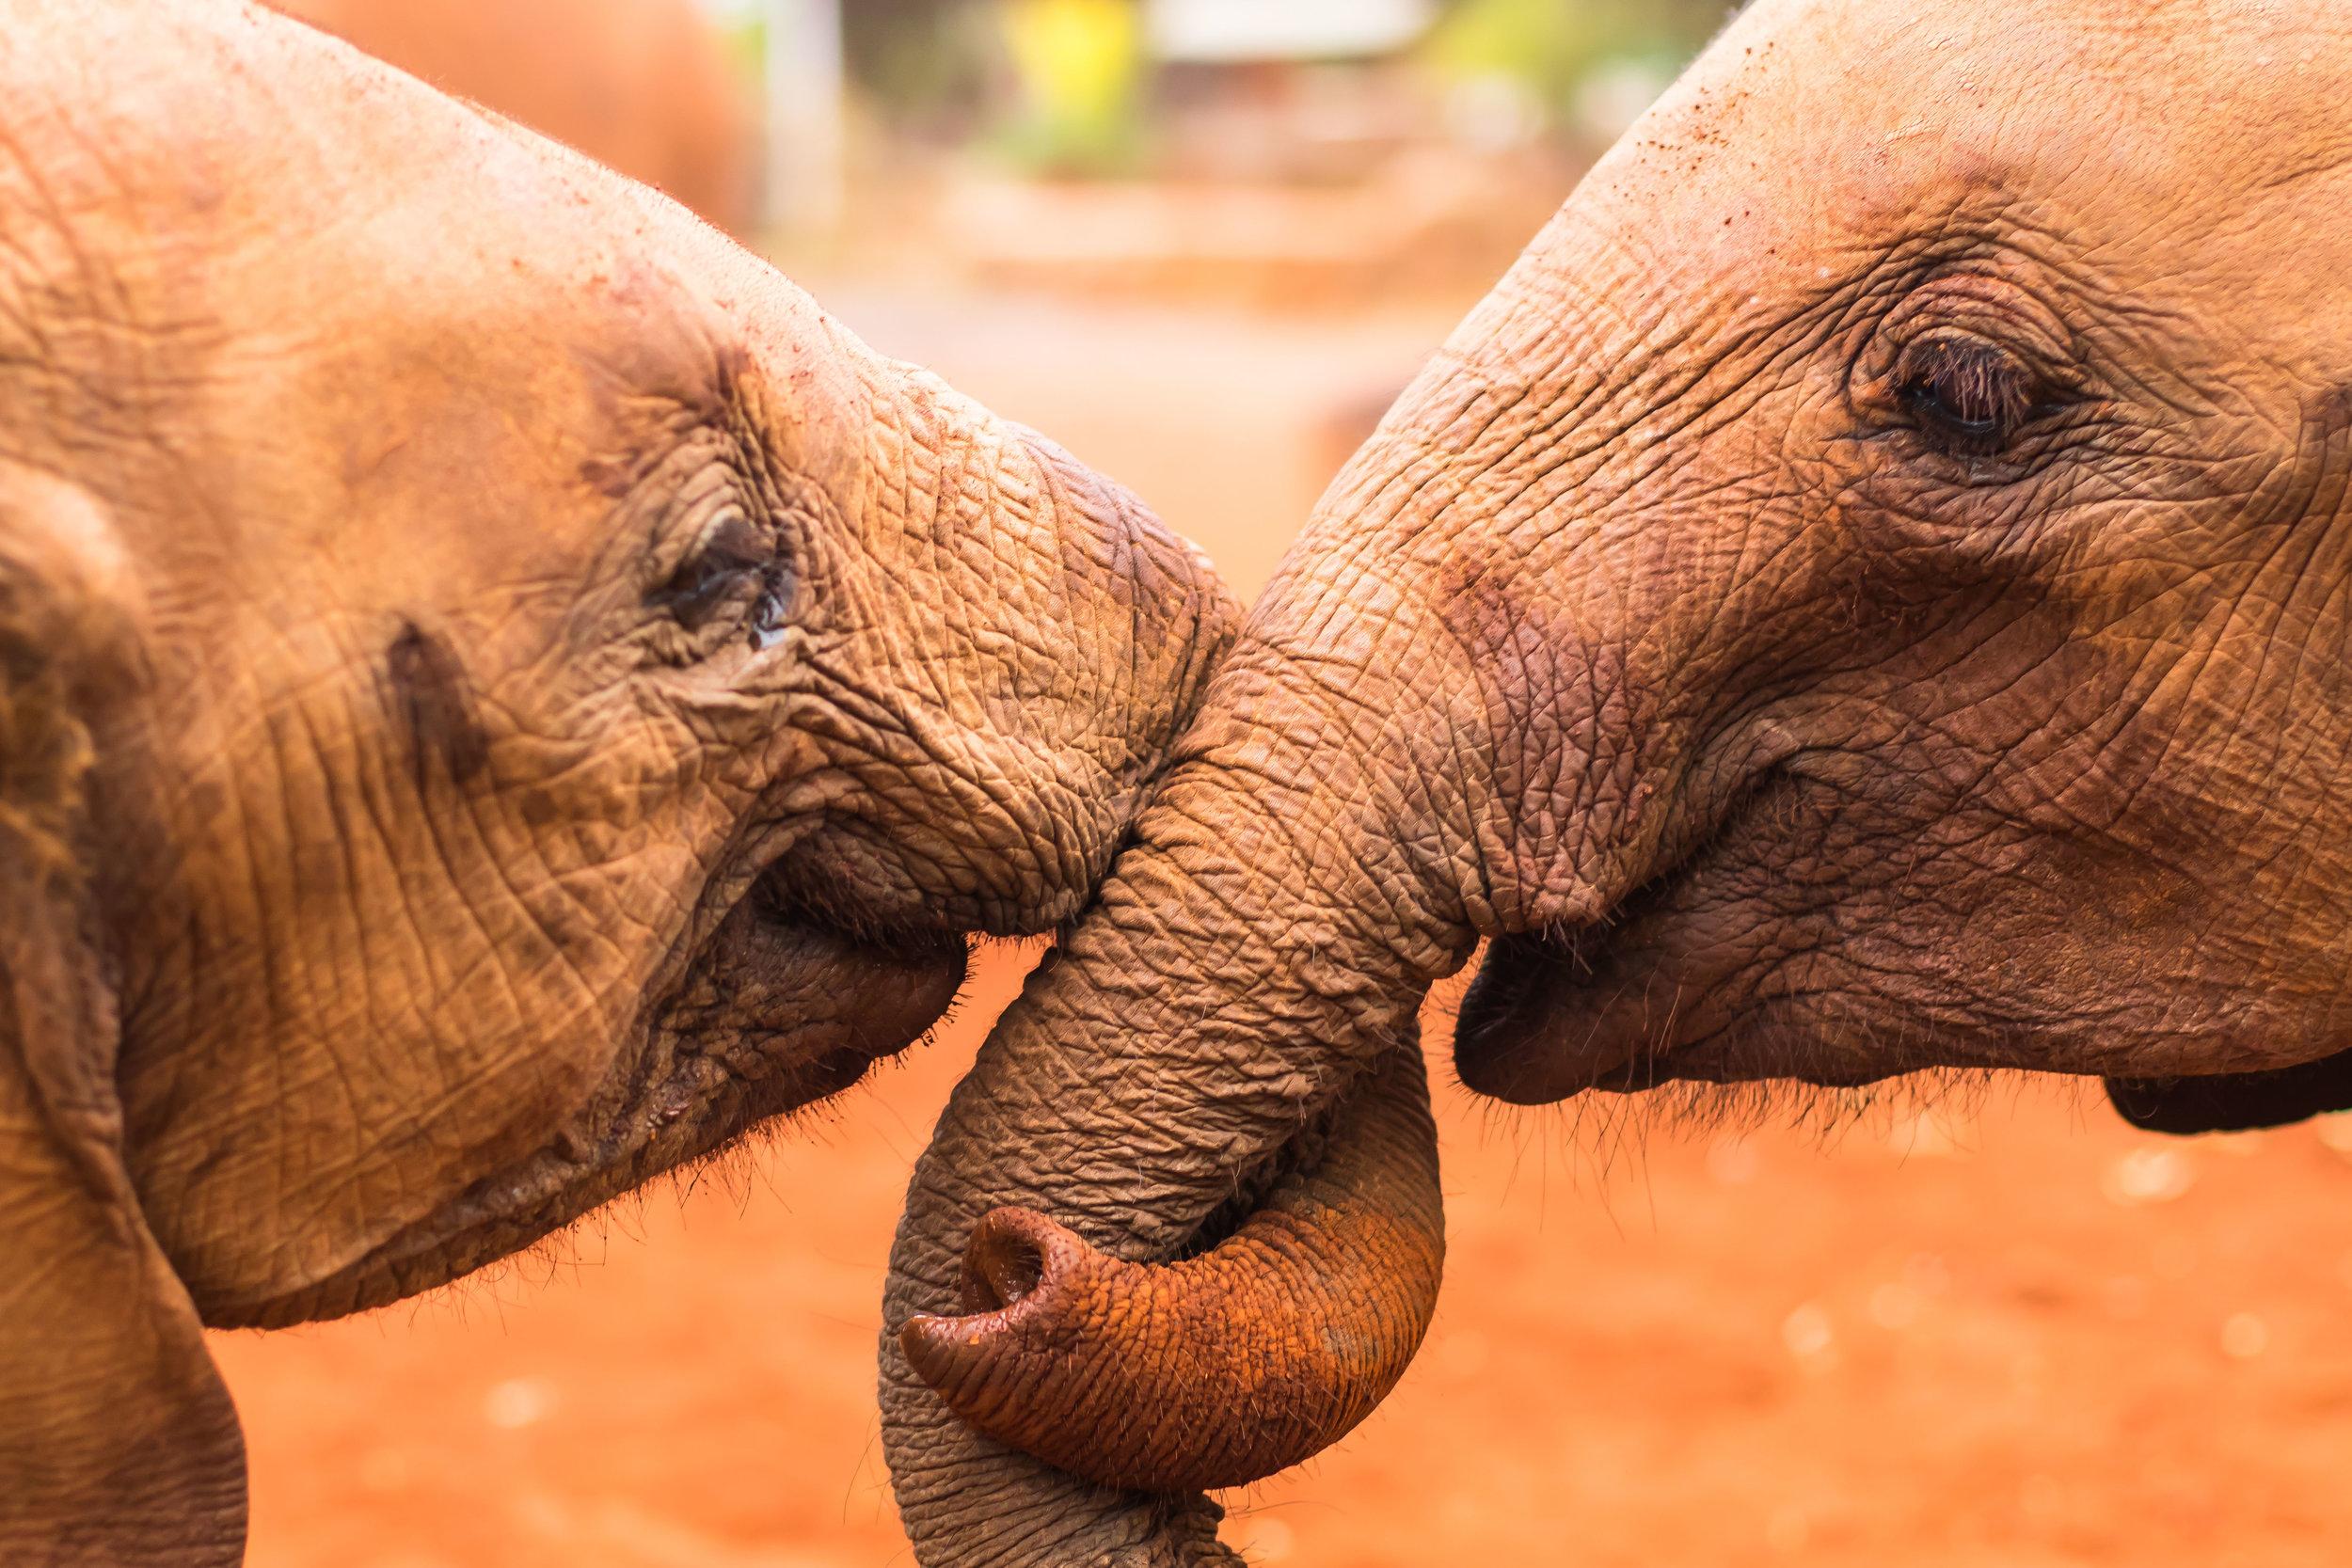 Animals_Website_Maxblakesberg-1.jpg